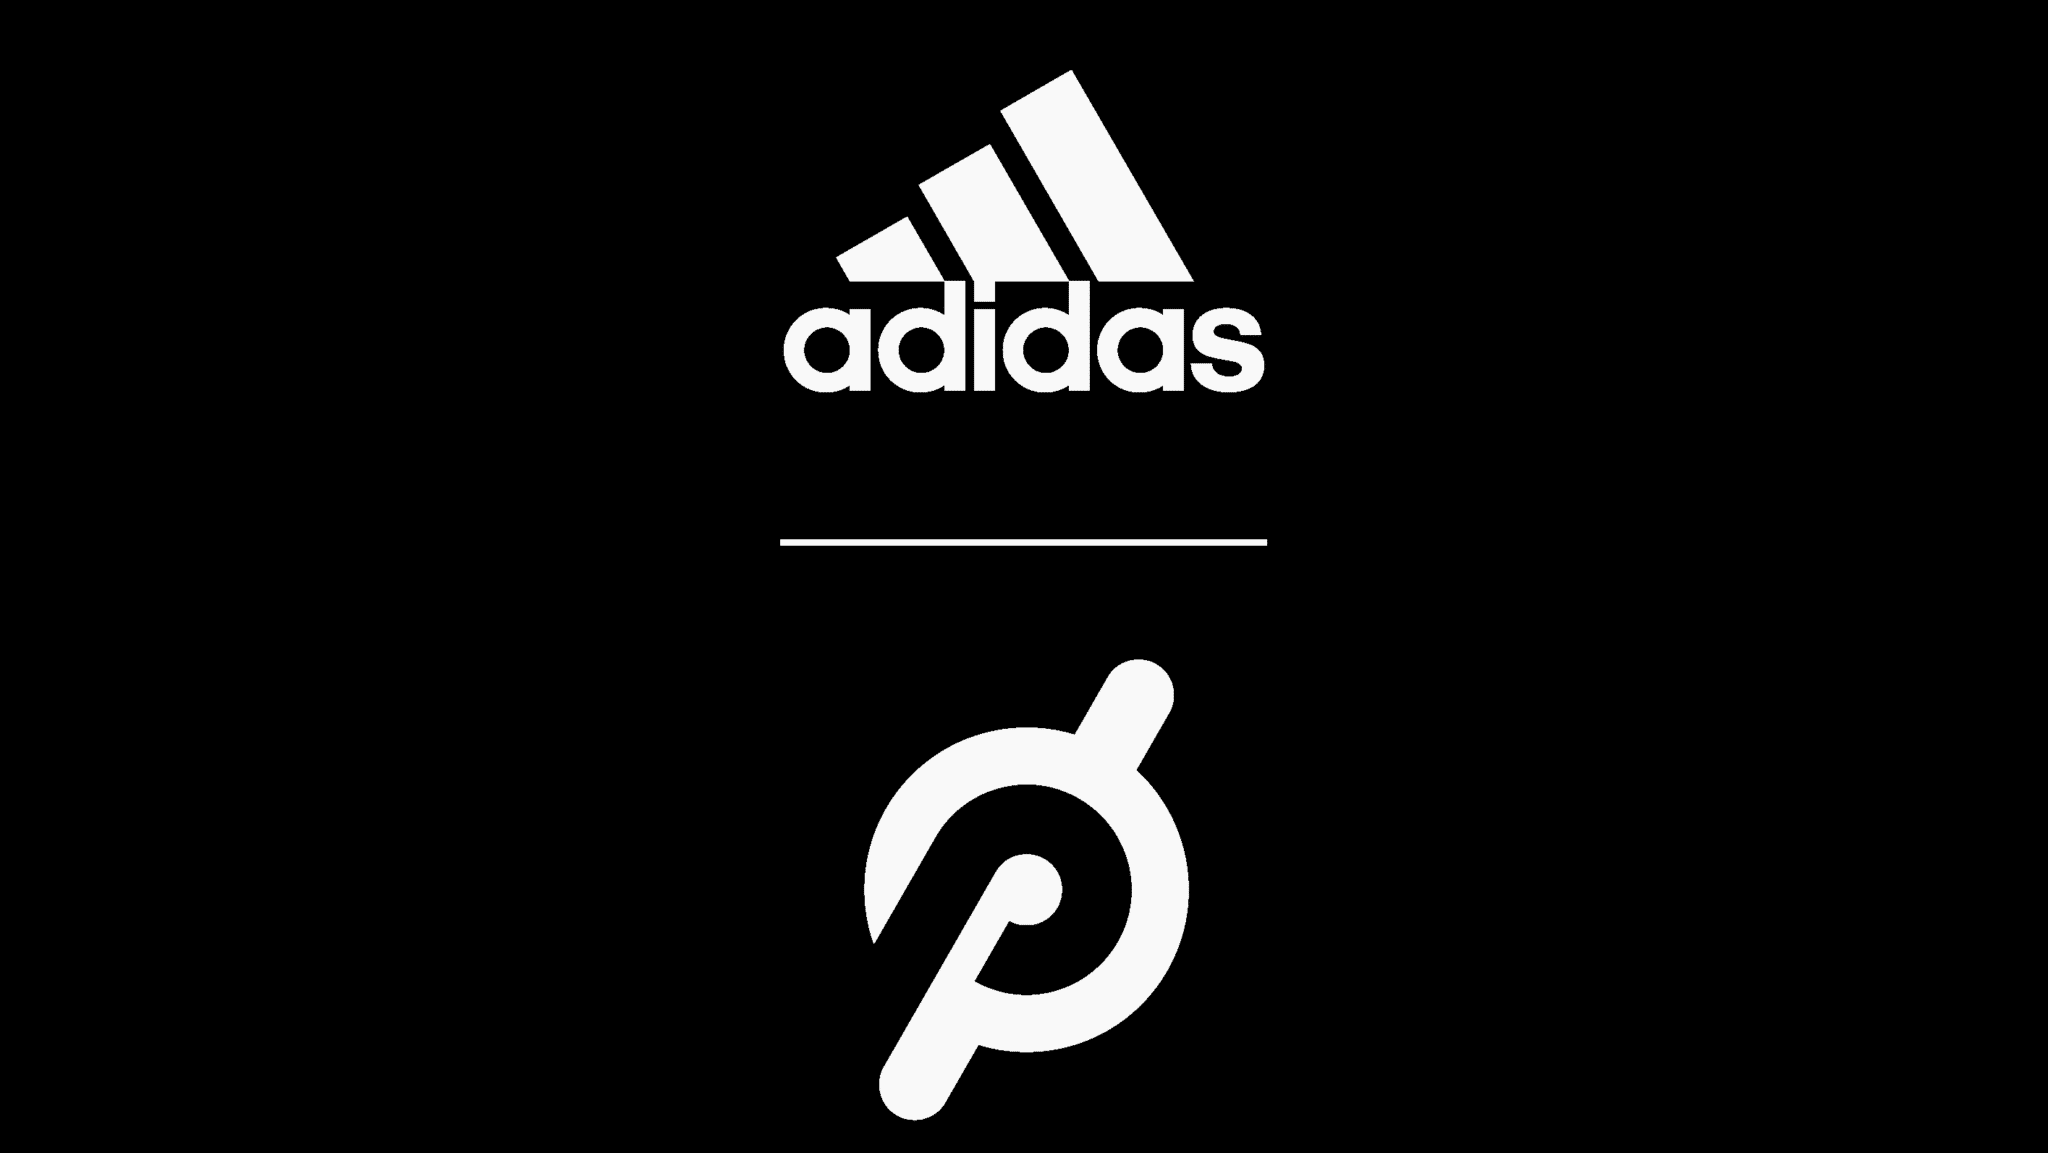 adidas and peloton